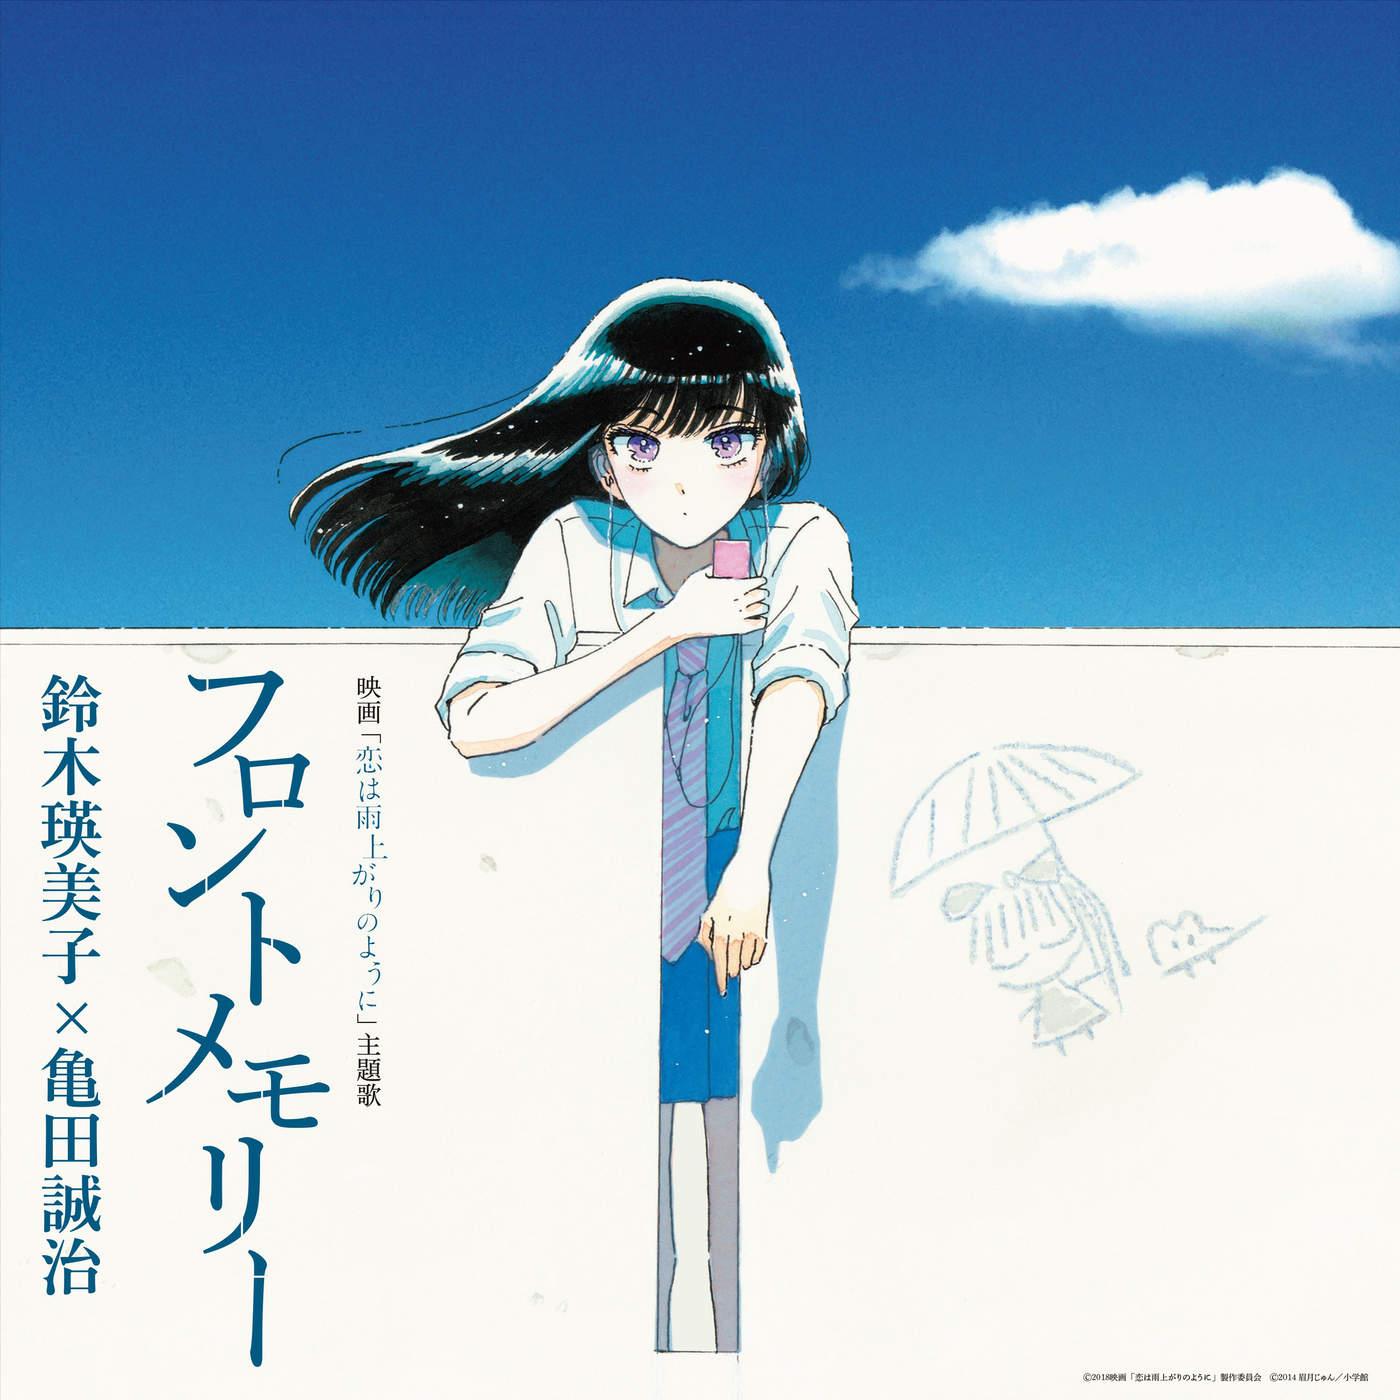 Emiko Suzuki×Seiji Kameda – Front Memory